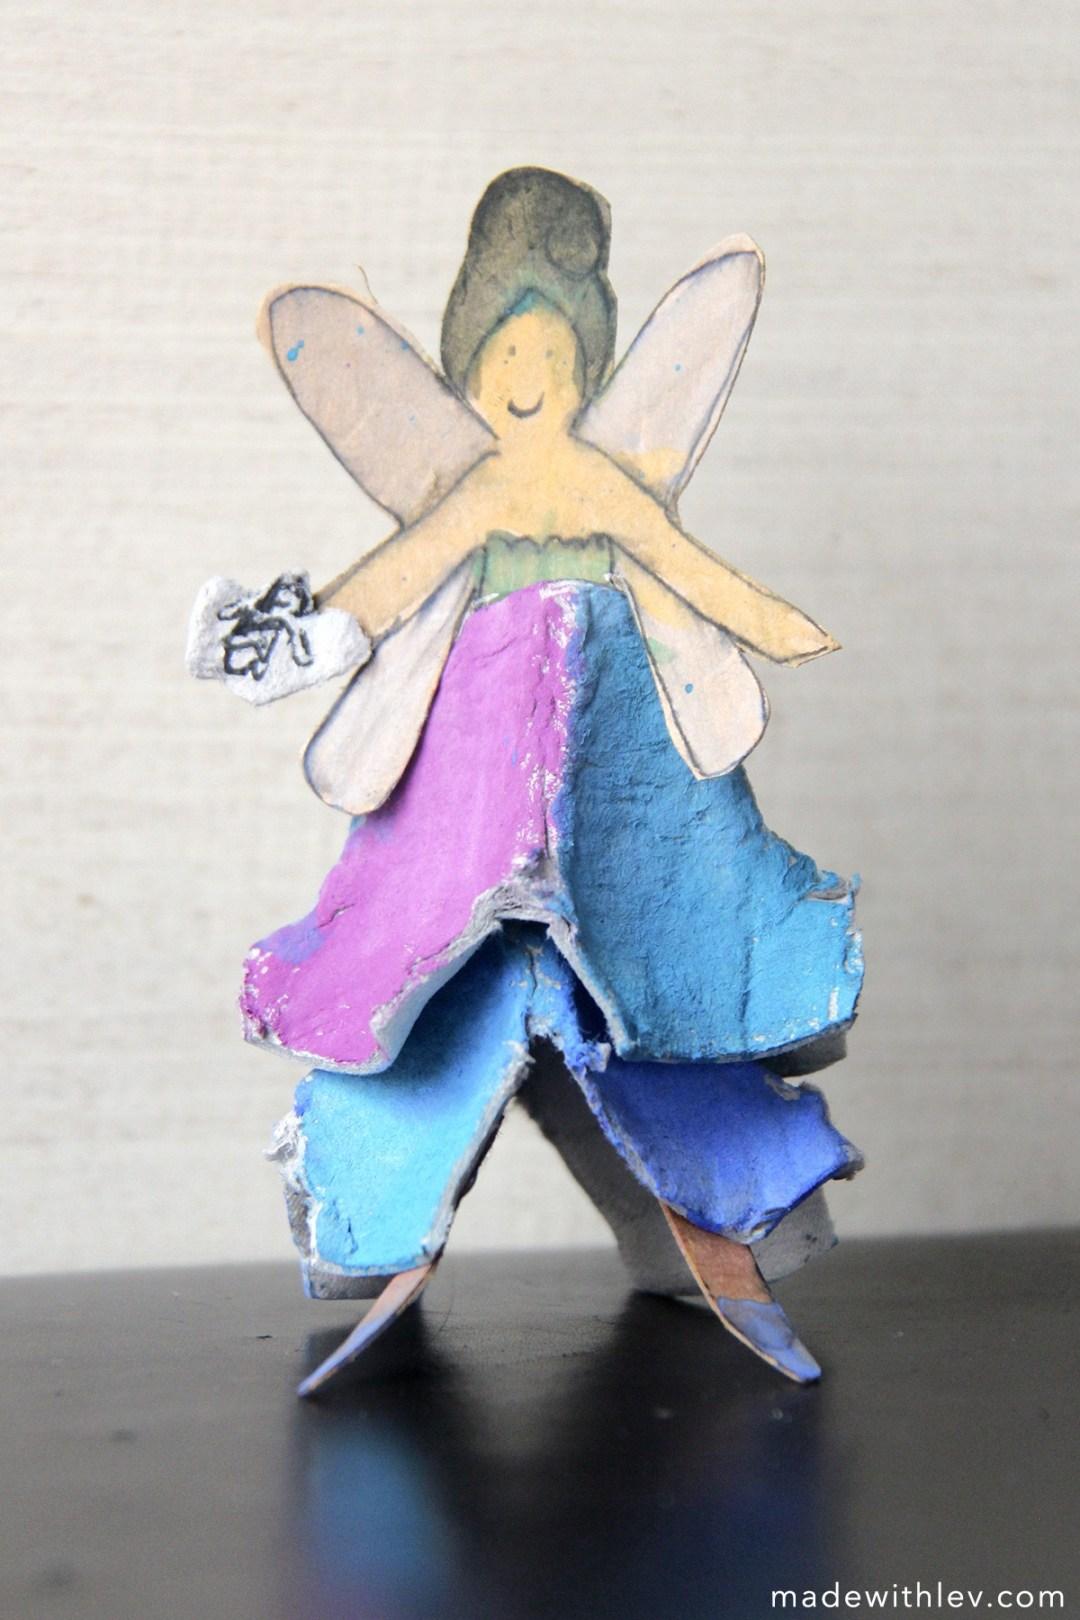 Egg carton fairies: fairies made from egg cartons and cardboard. Tutorial via ART CAMP.